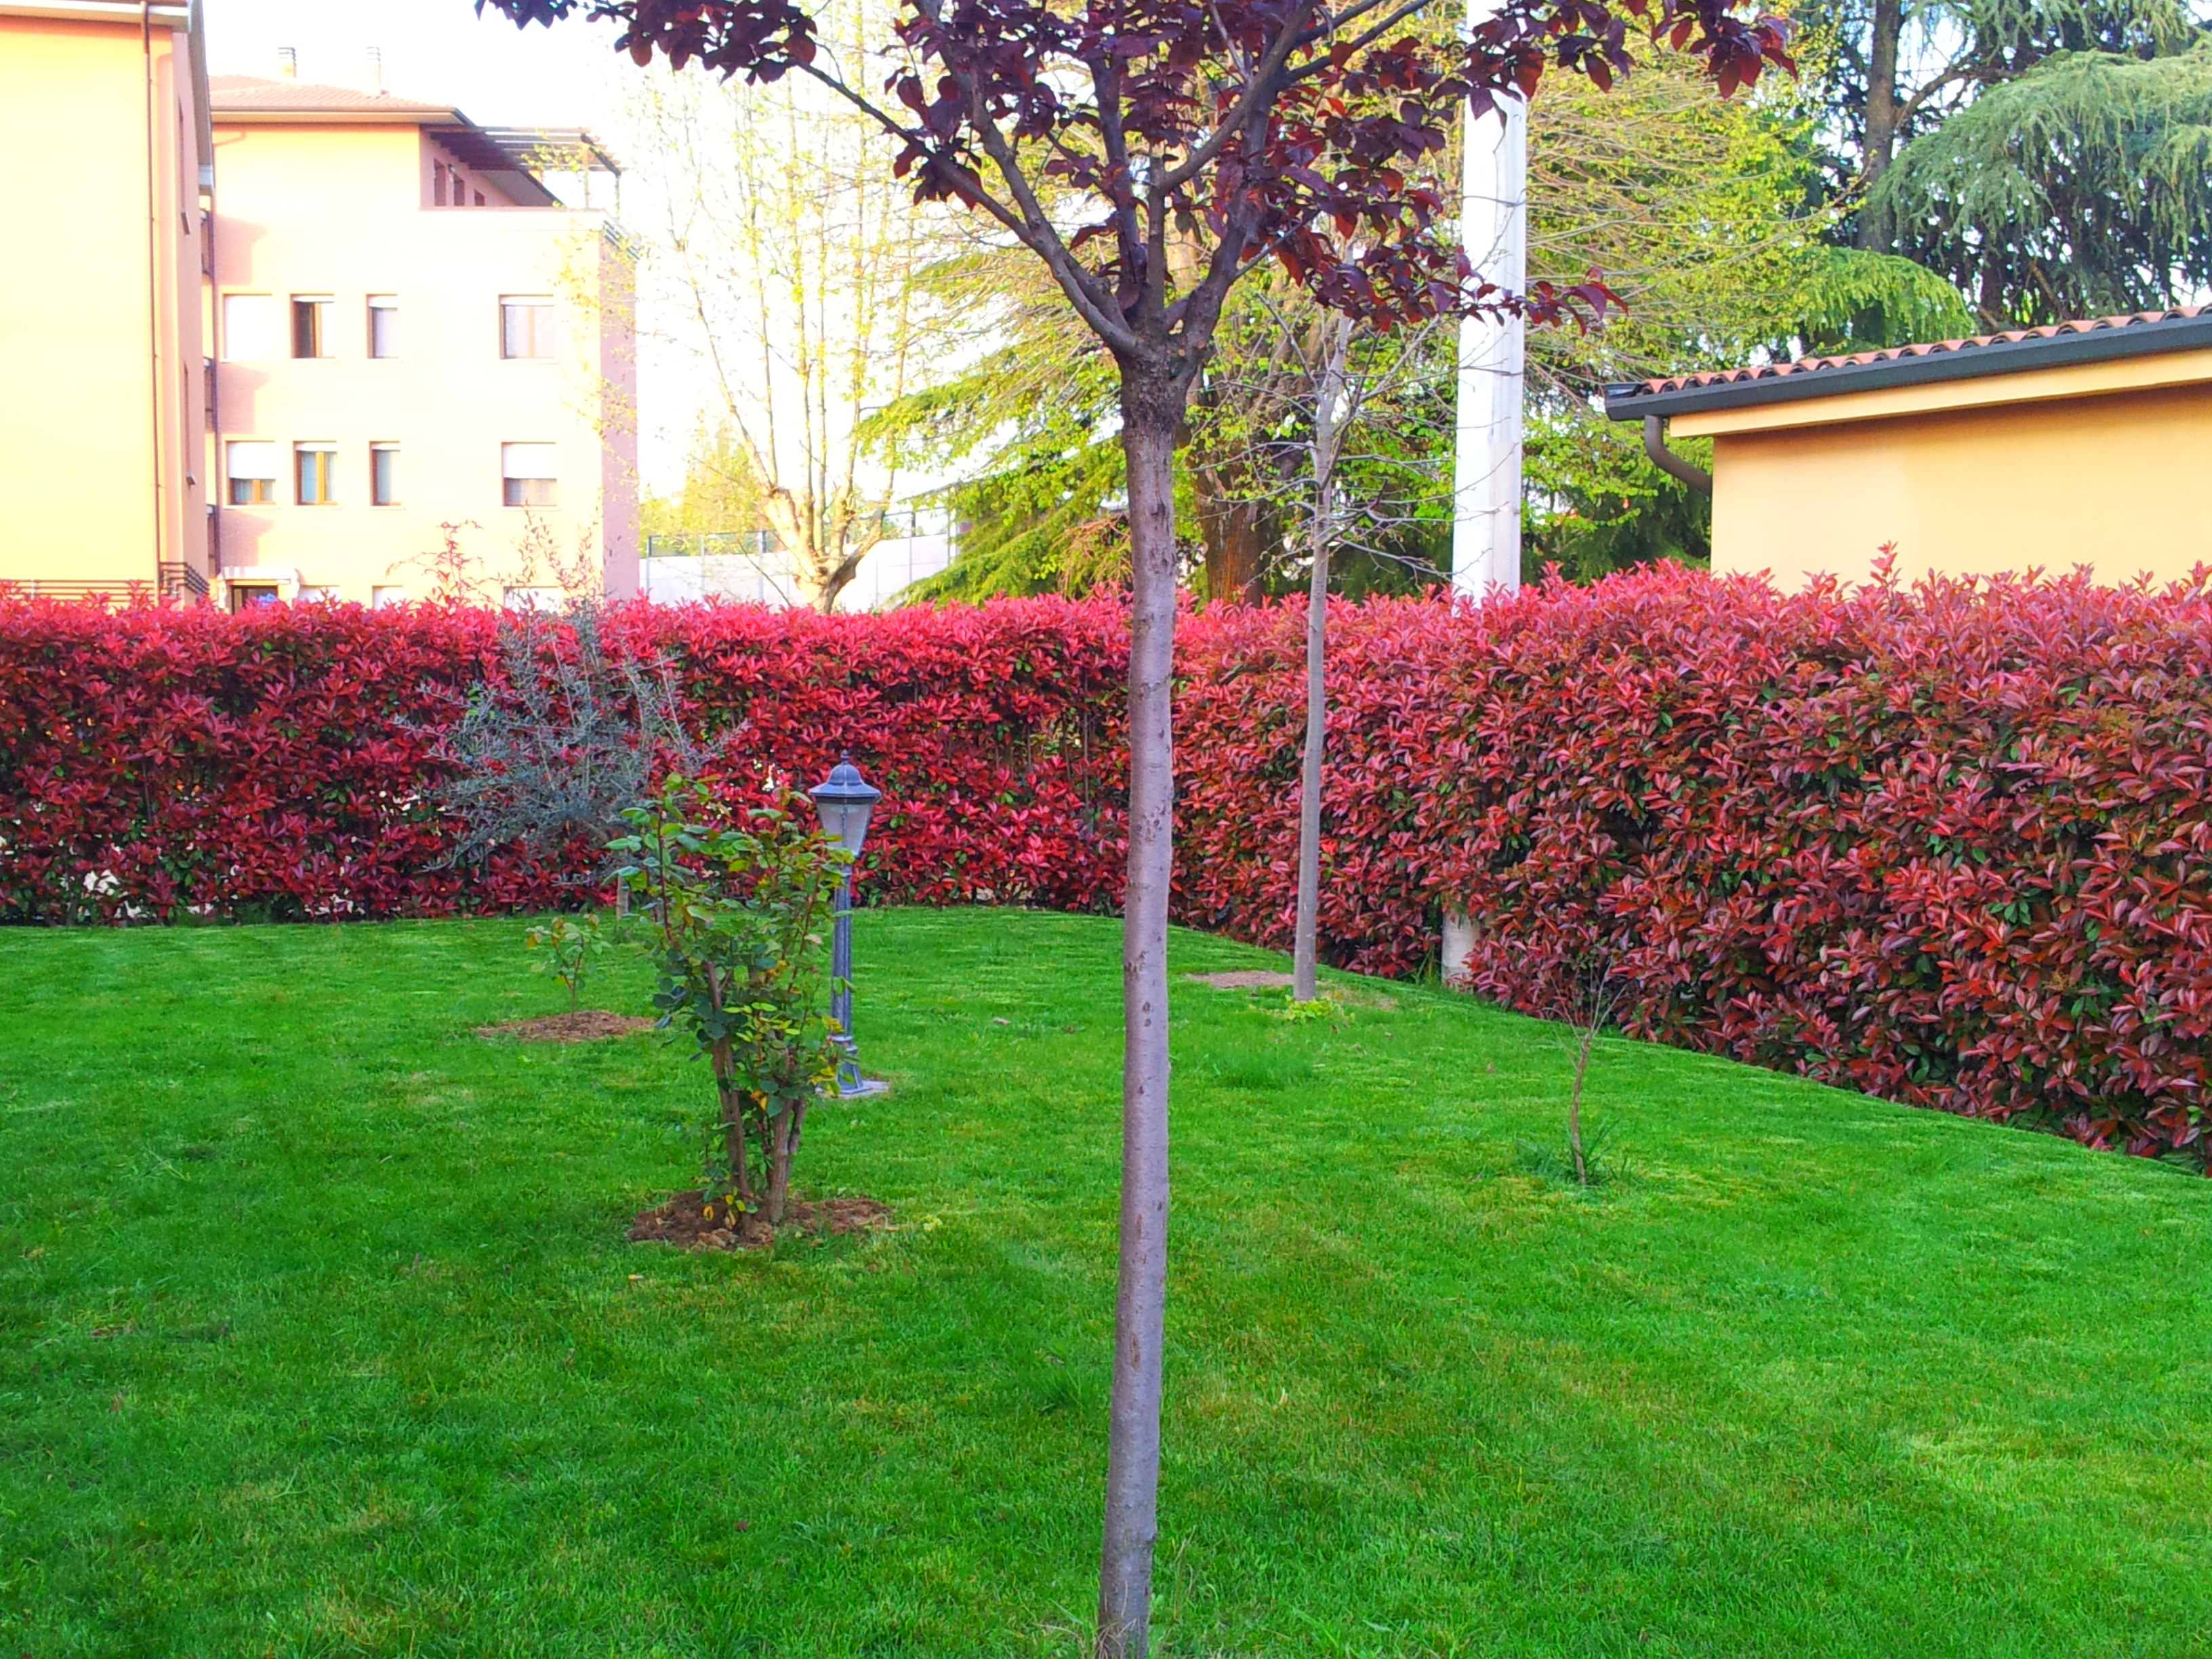 Photinia pianta per siepi da giardino - Piante per giardino ...